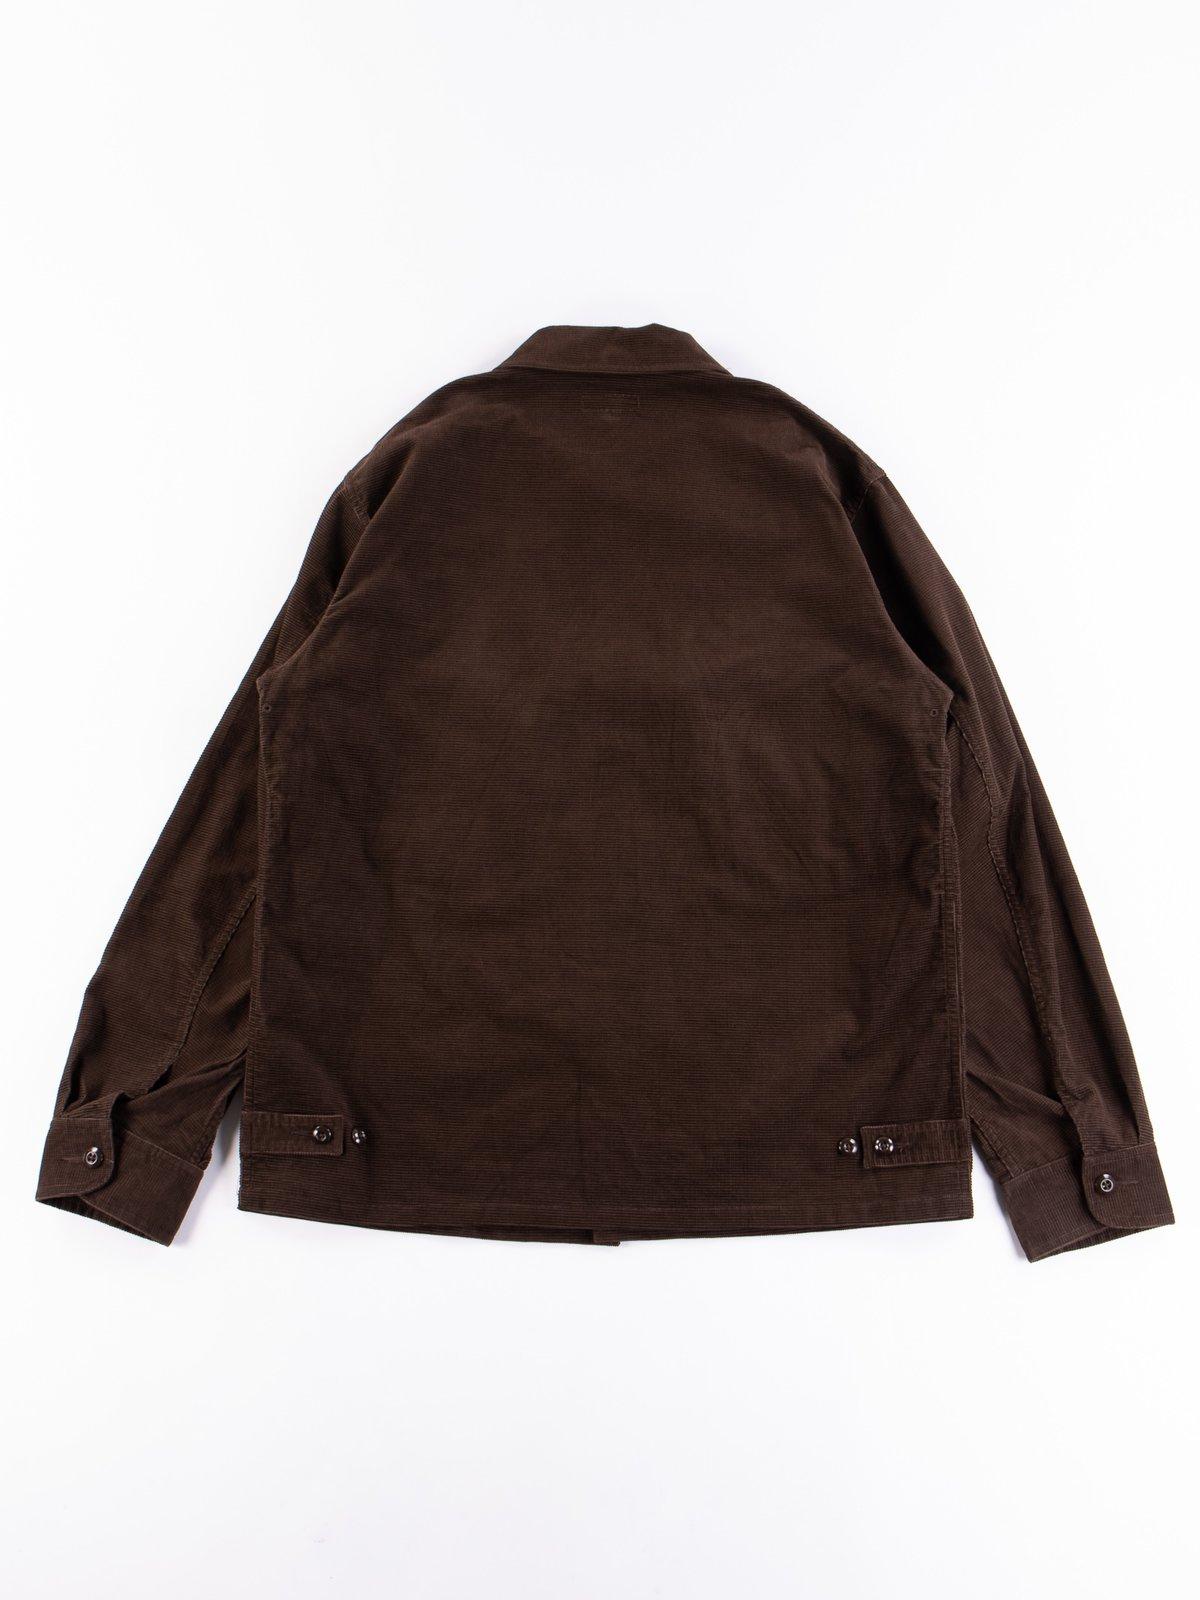 Dark Brown Dobby Caramel Corduroy Combat Short Jacket - Image 6